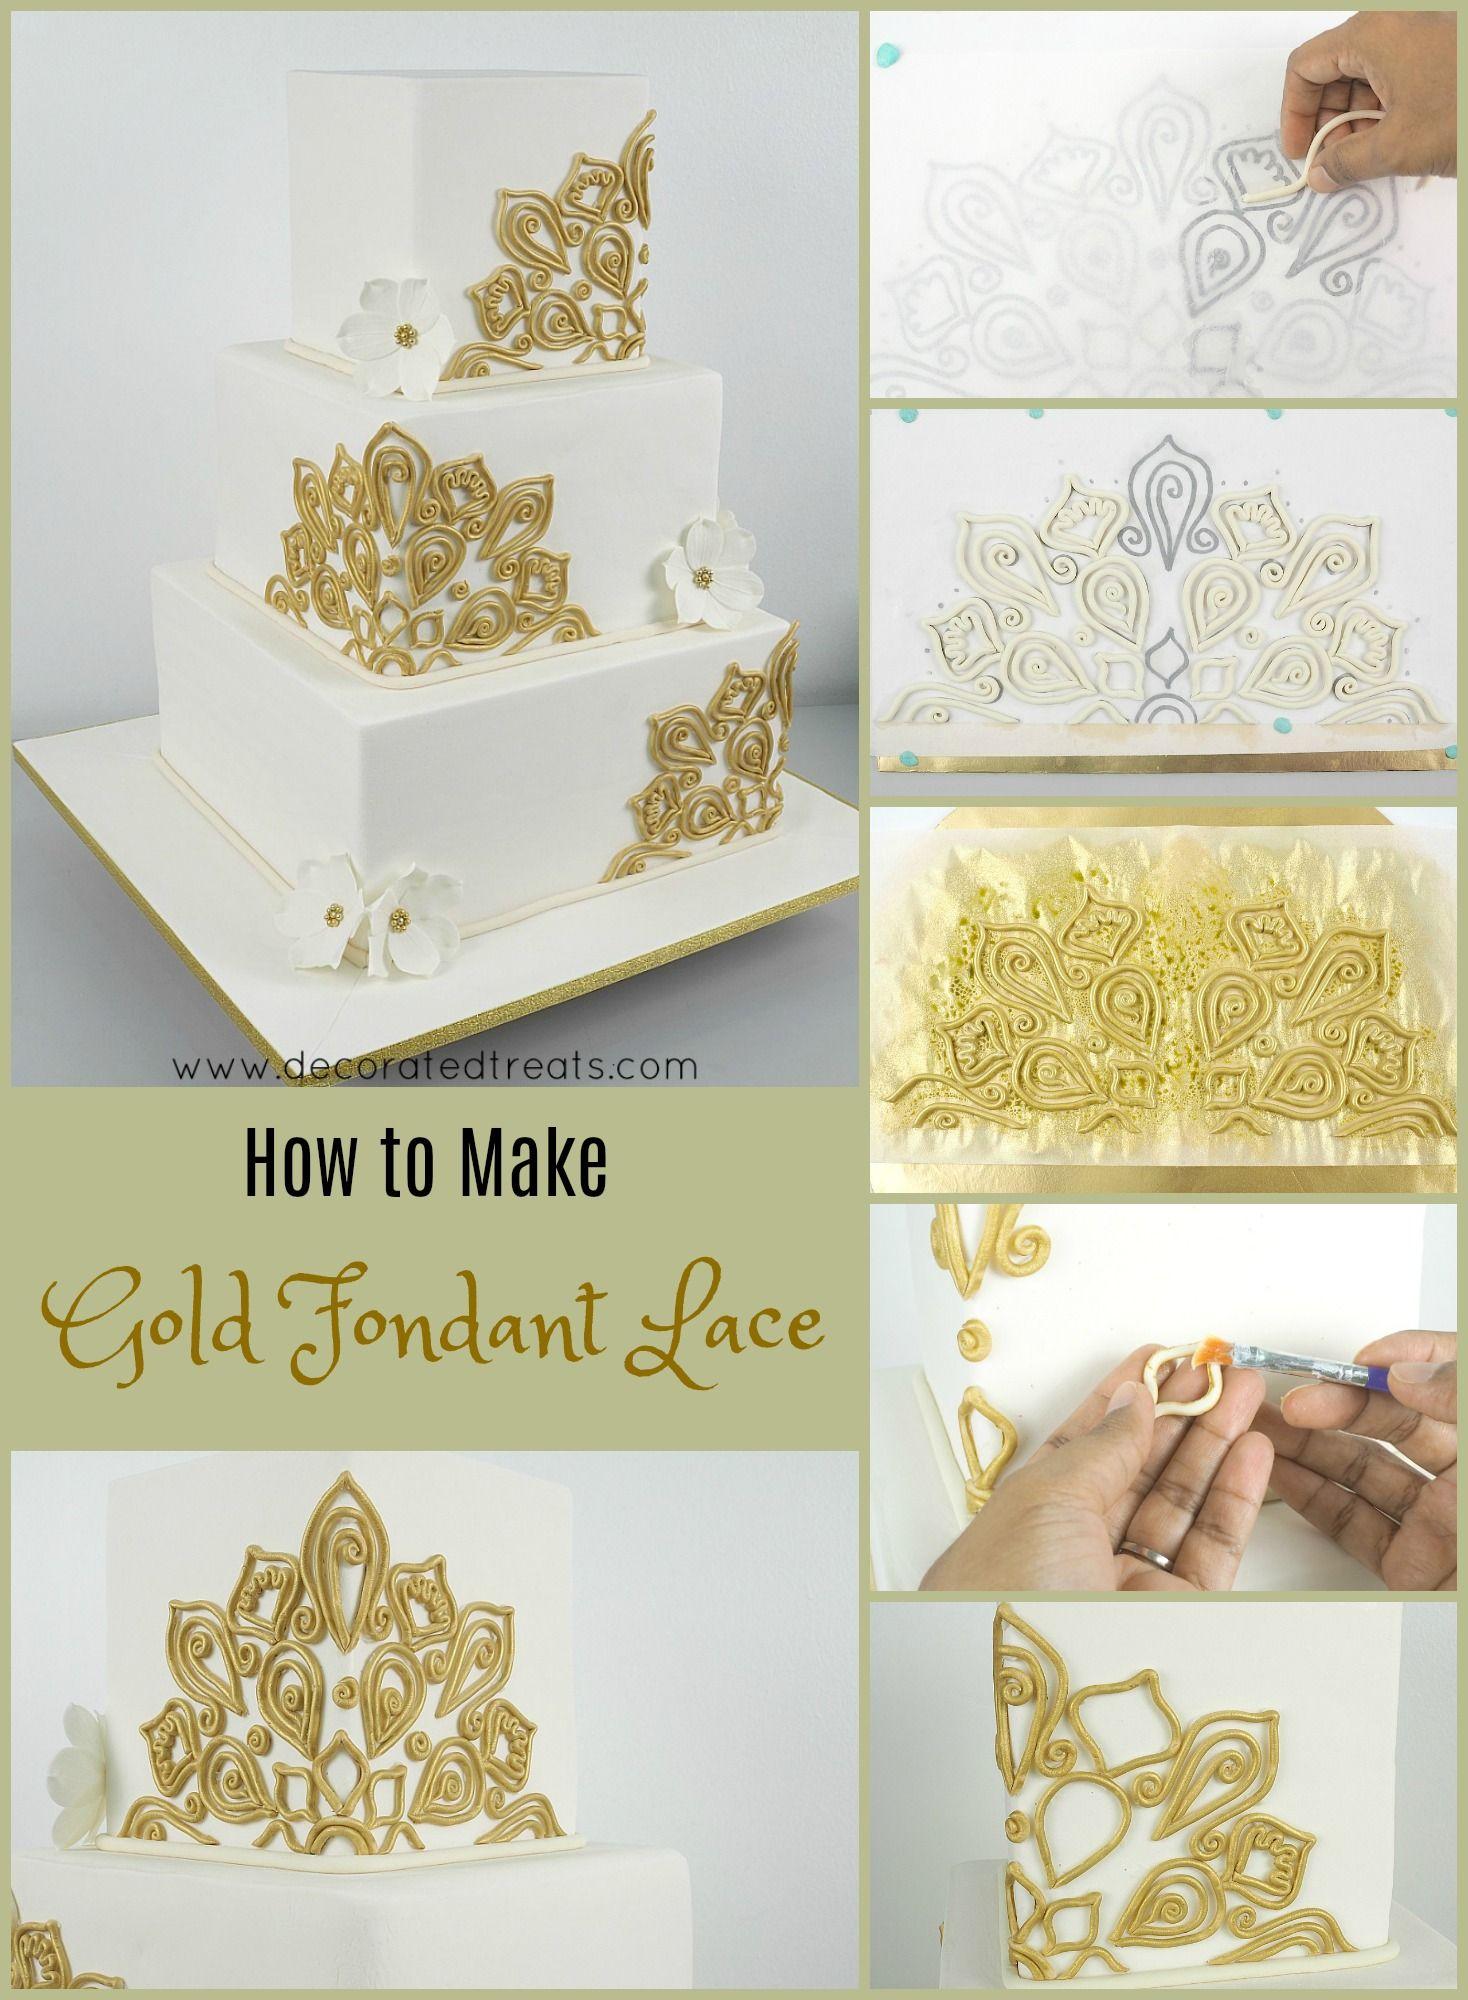 Square wedding cake in anatomy of a wedding cake pinterest